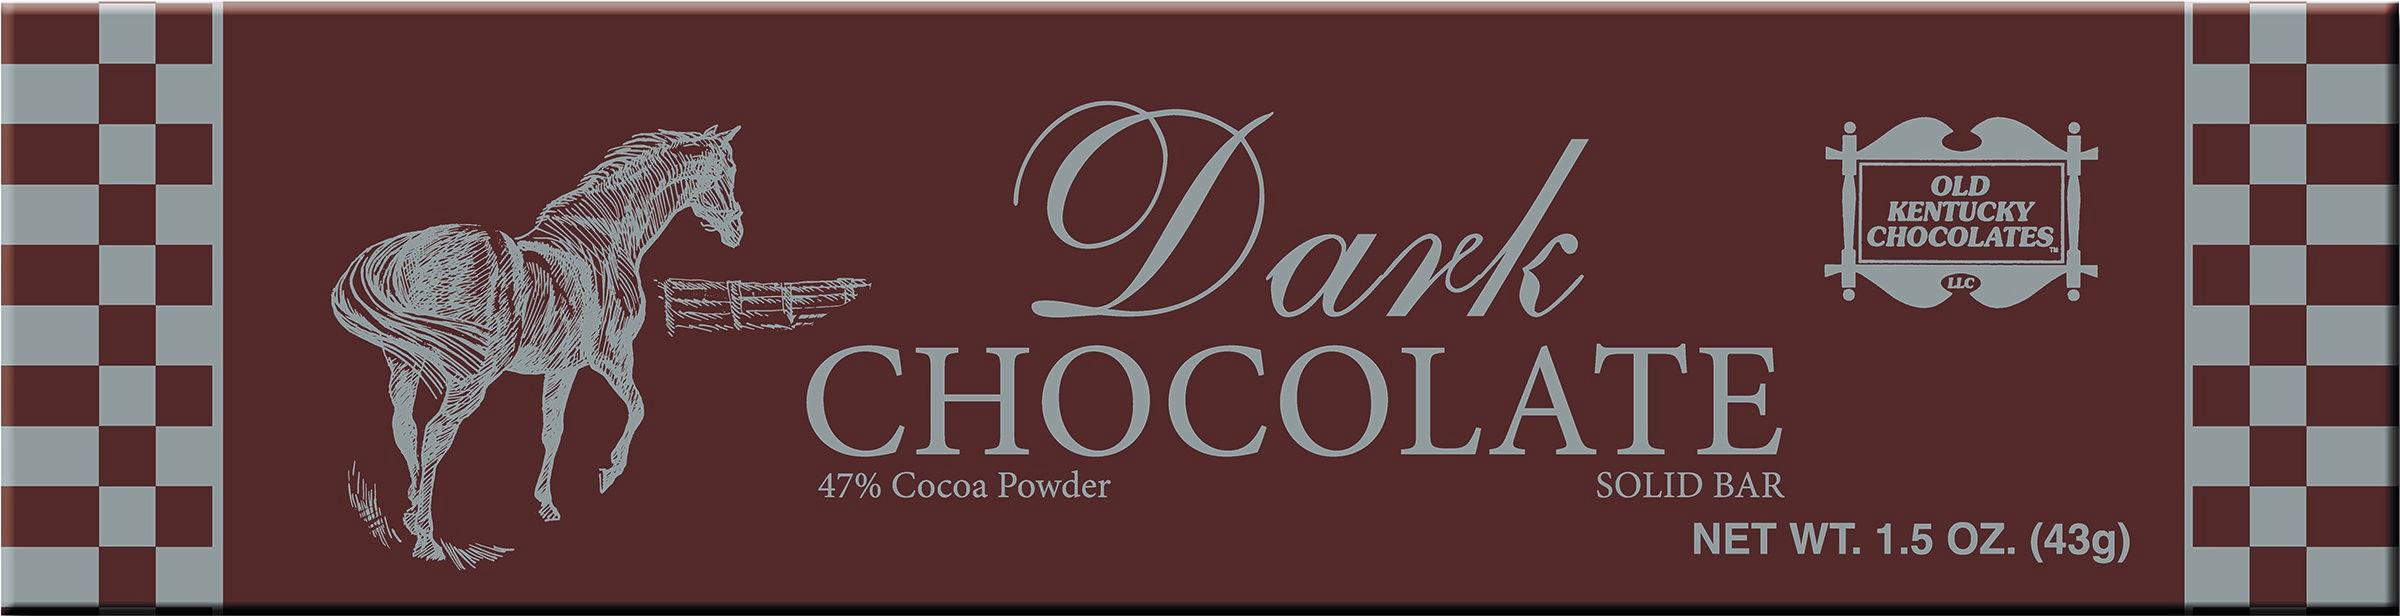 Old Kentucky Chocolates Dark Chocolate Fundraising